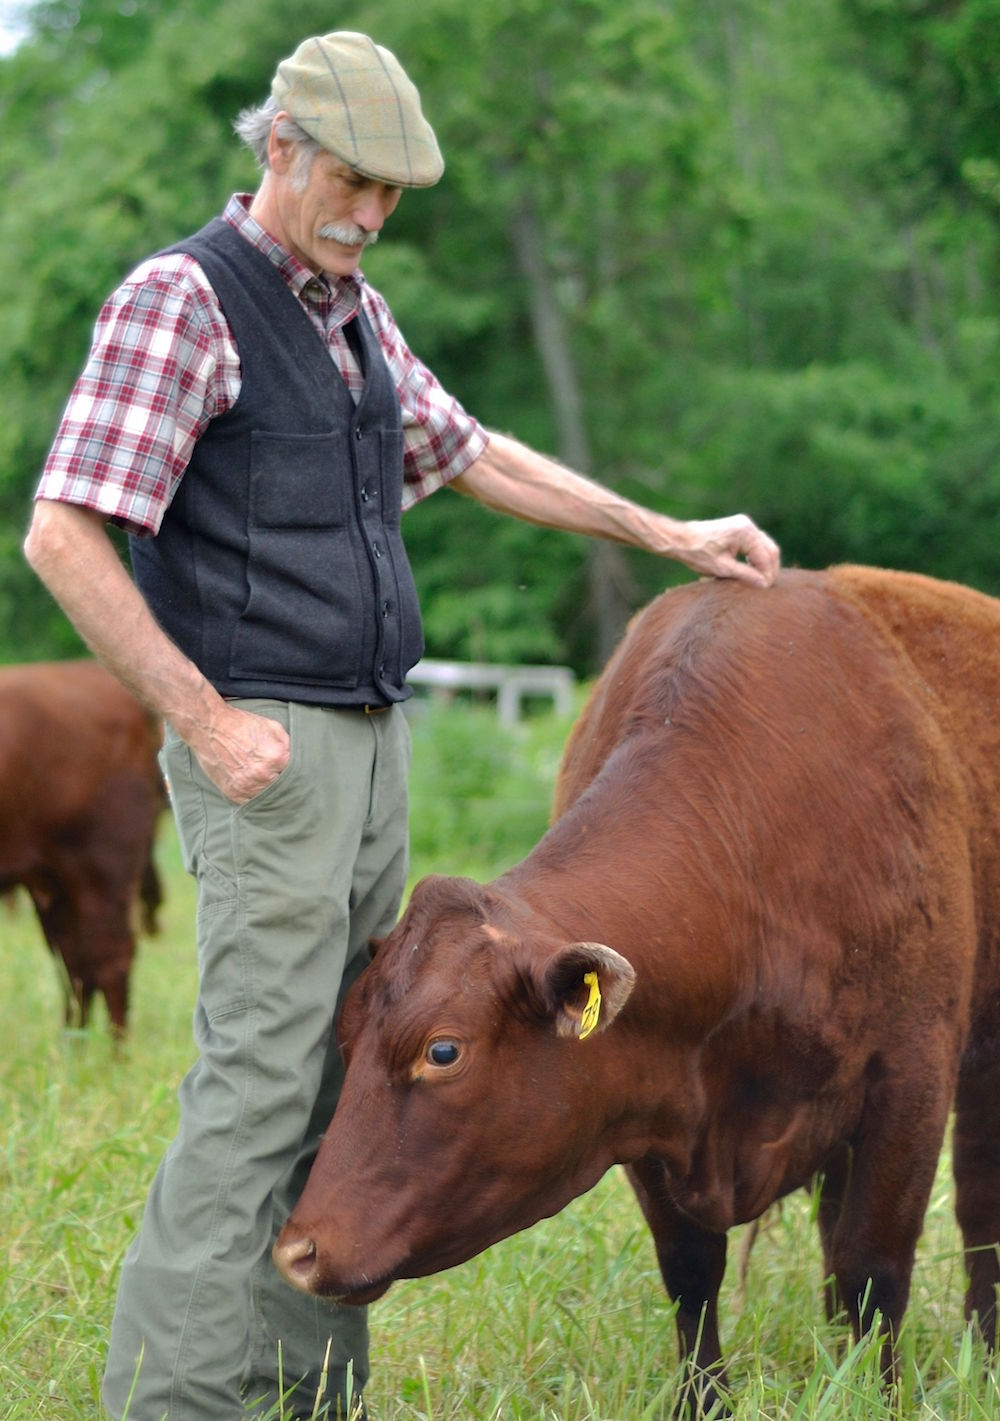 Ridge, cow, portrait 2.5MB